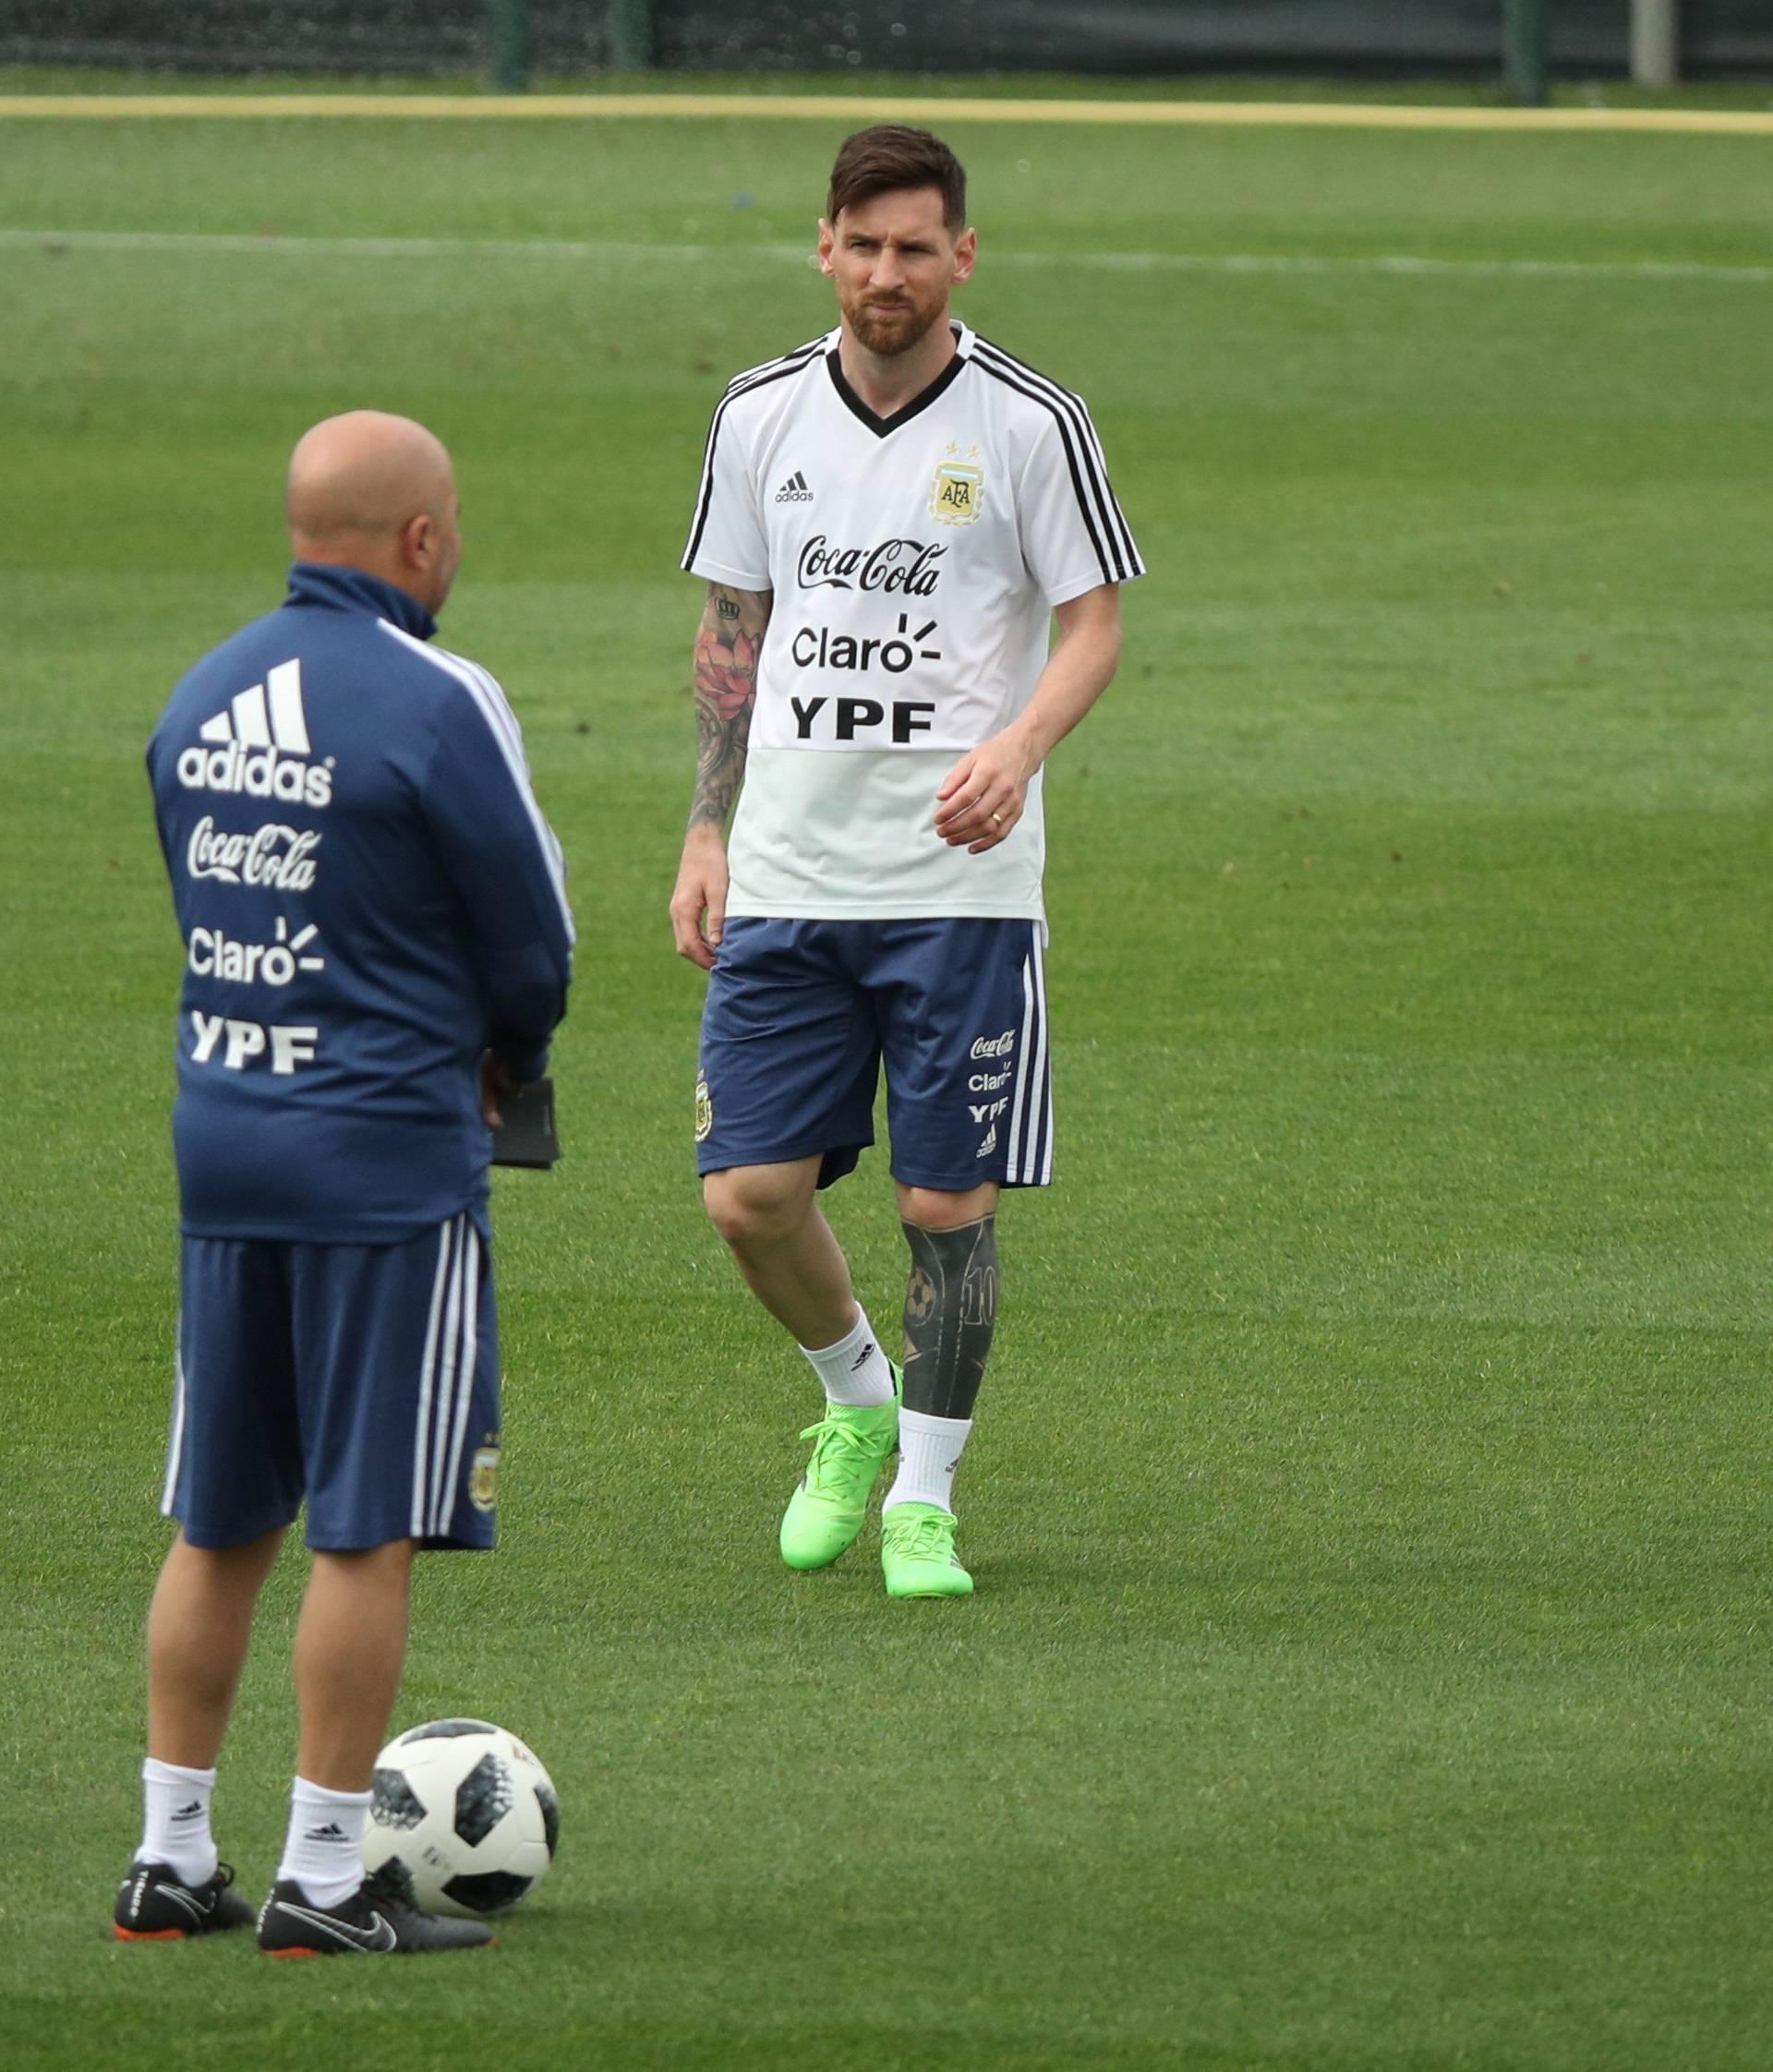 FIFA World Cup - Argentina Training